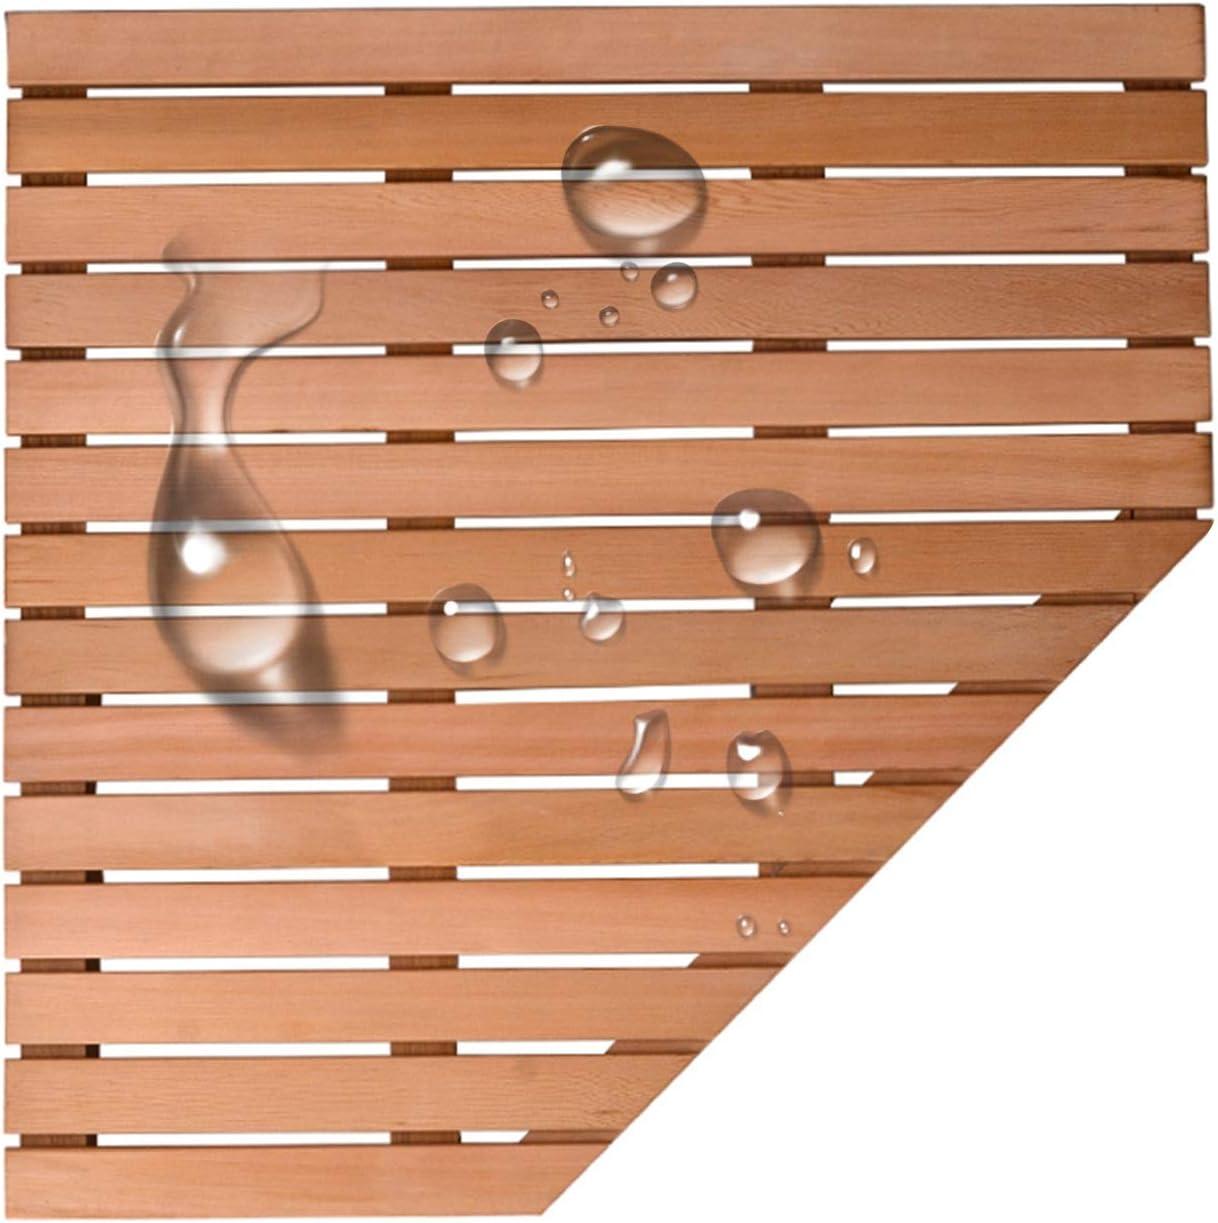 JIAJUAN Cheap bargain Natural Wood Safety and trust Shower Bath Non-Sli Foot Kitchen Pedal Mat